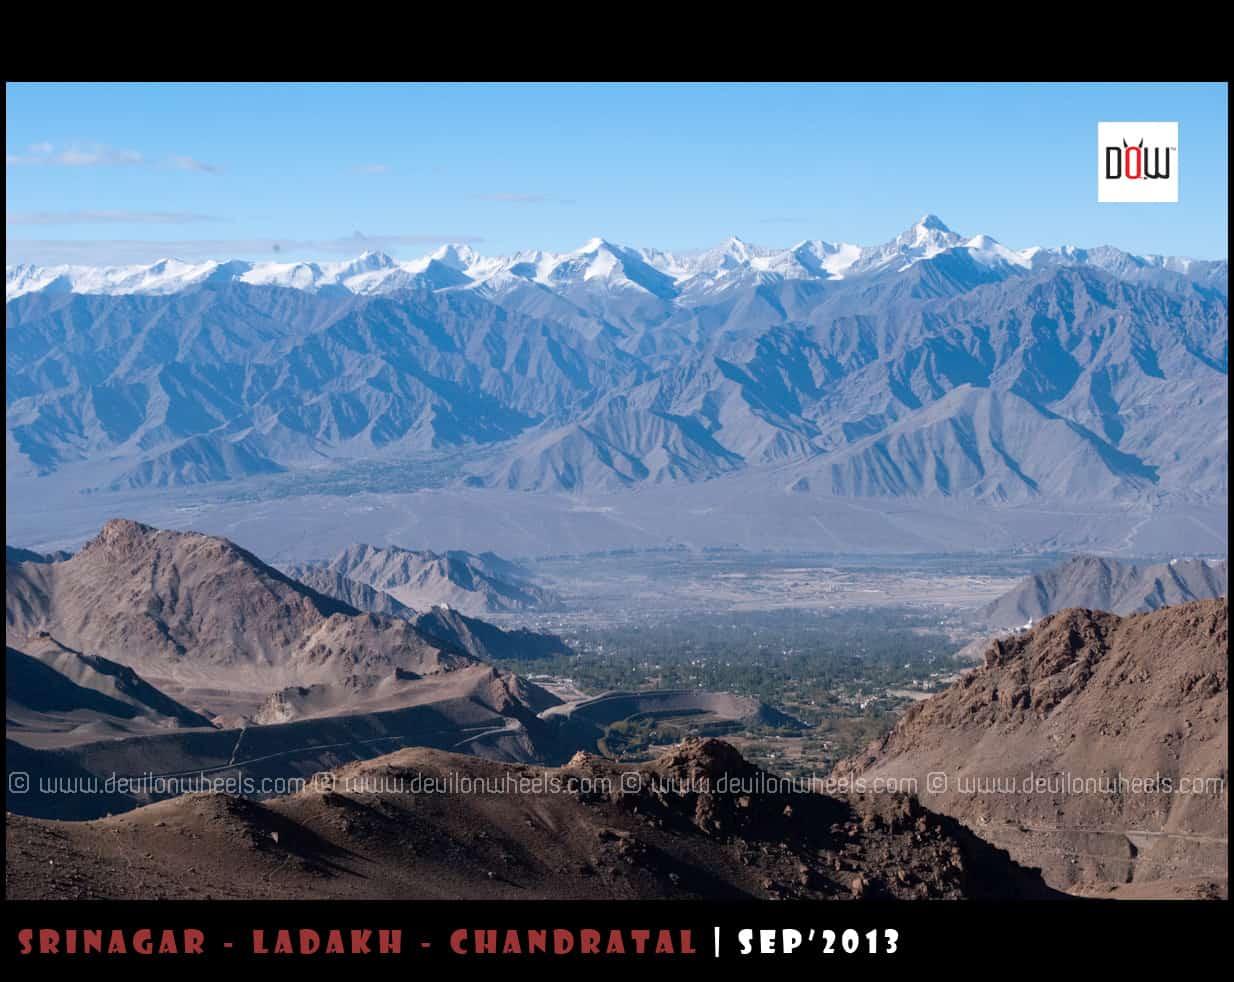 Stok Range, guarding the Heaven called Ladakh